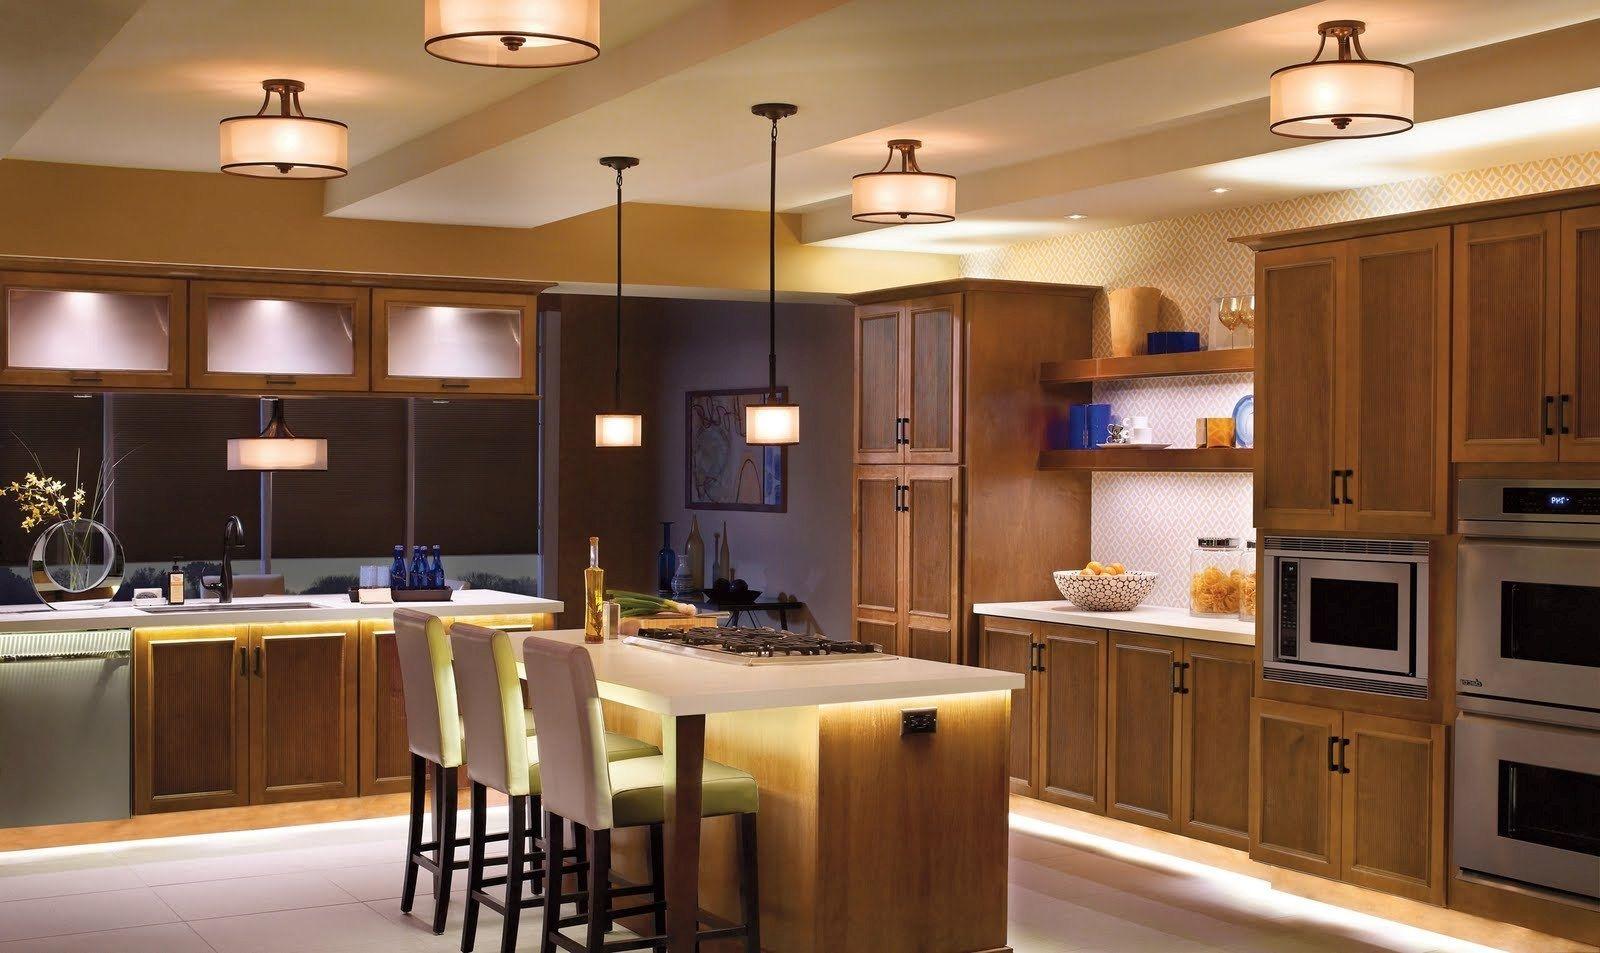 Led Lighting For Kitchen Ceilings Http Creativechairsandtables  ~ Iluminacion Para Cocinas Techos